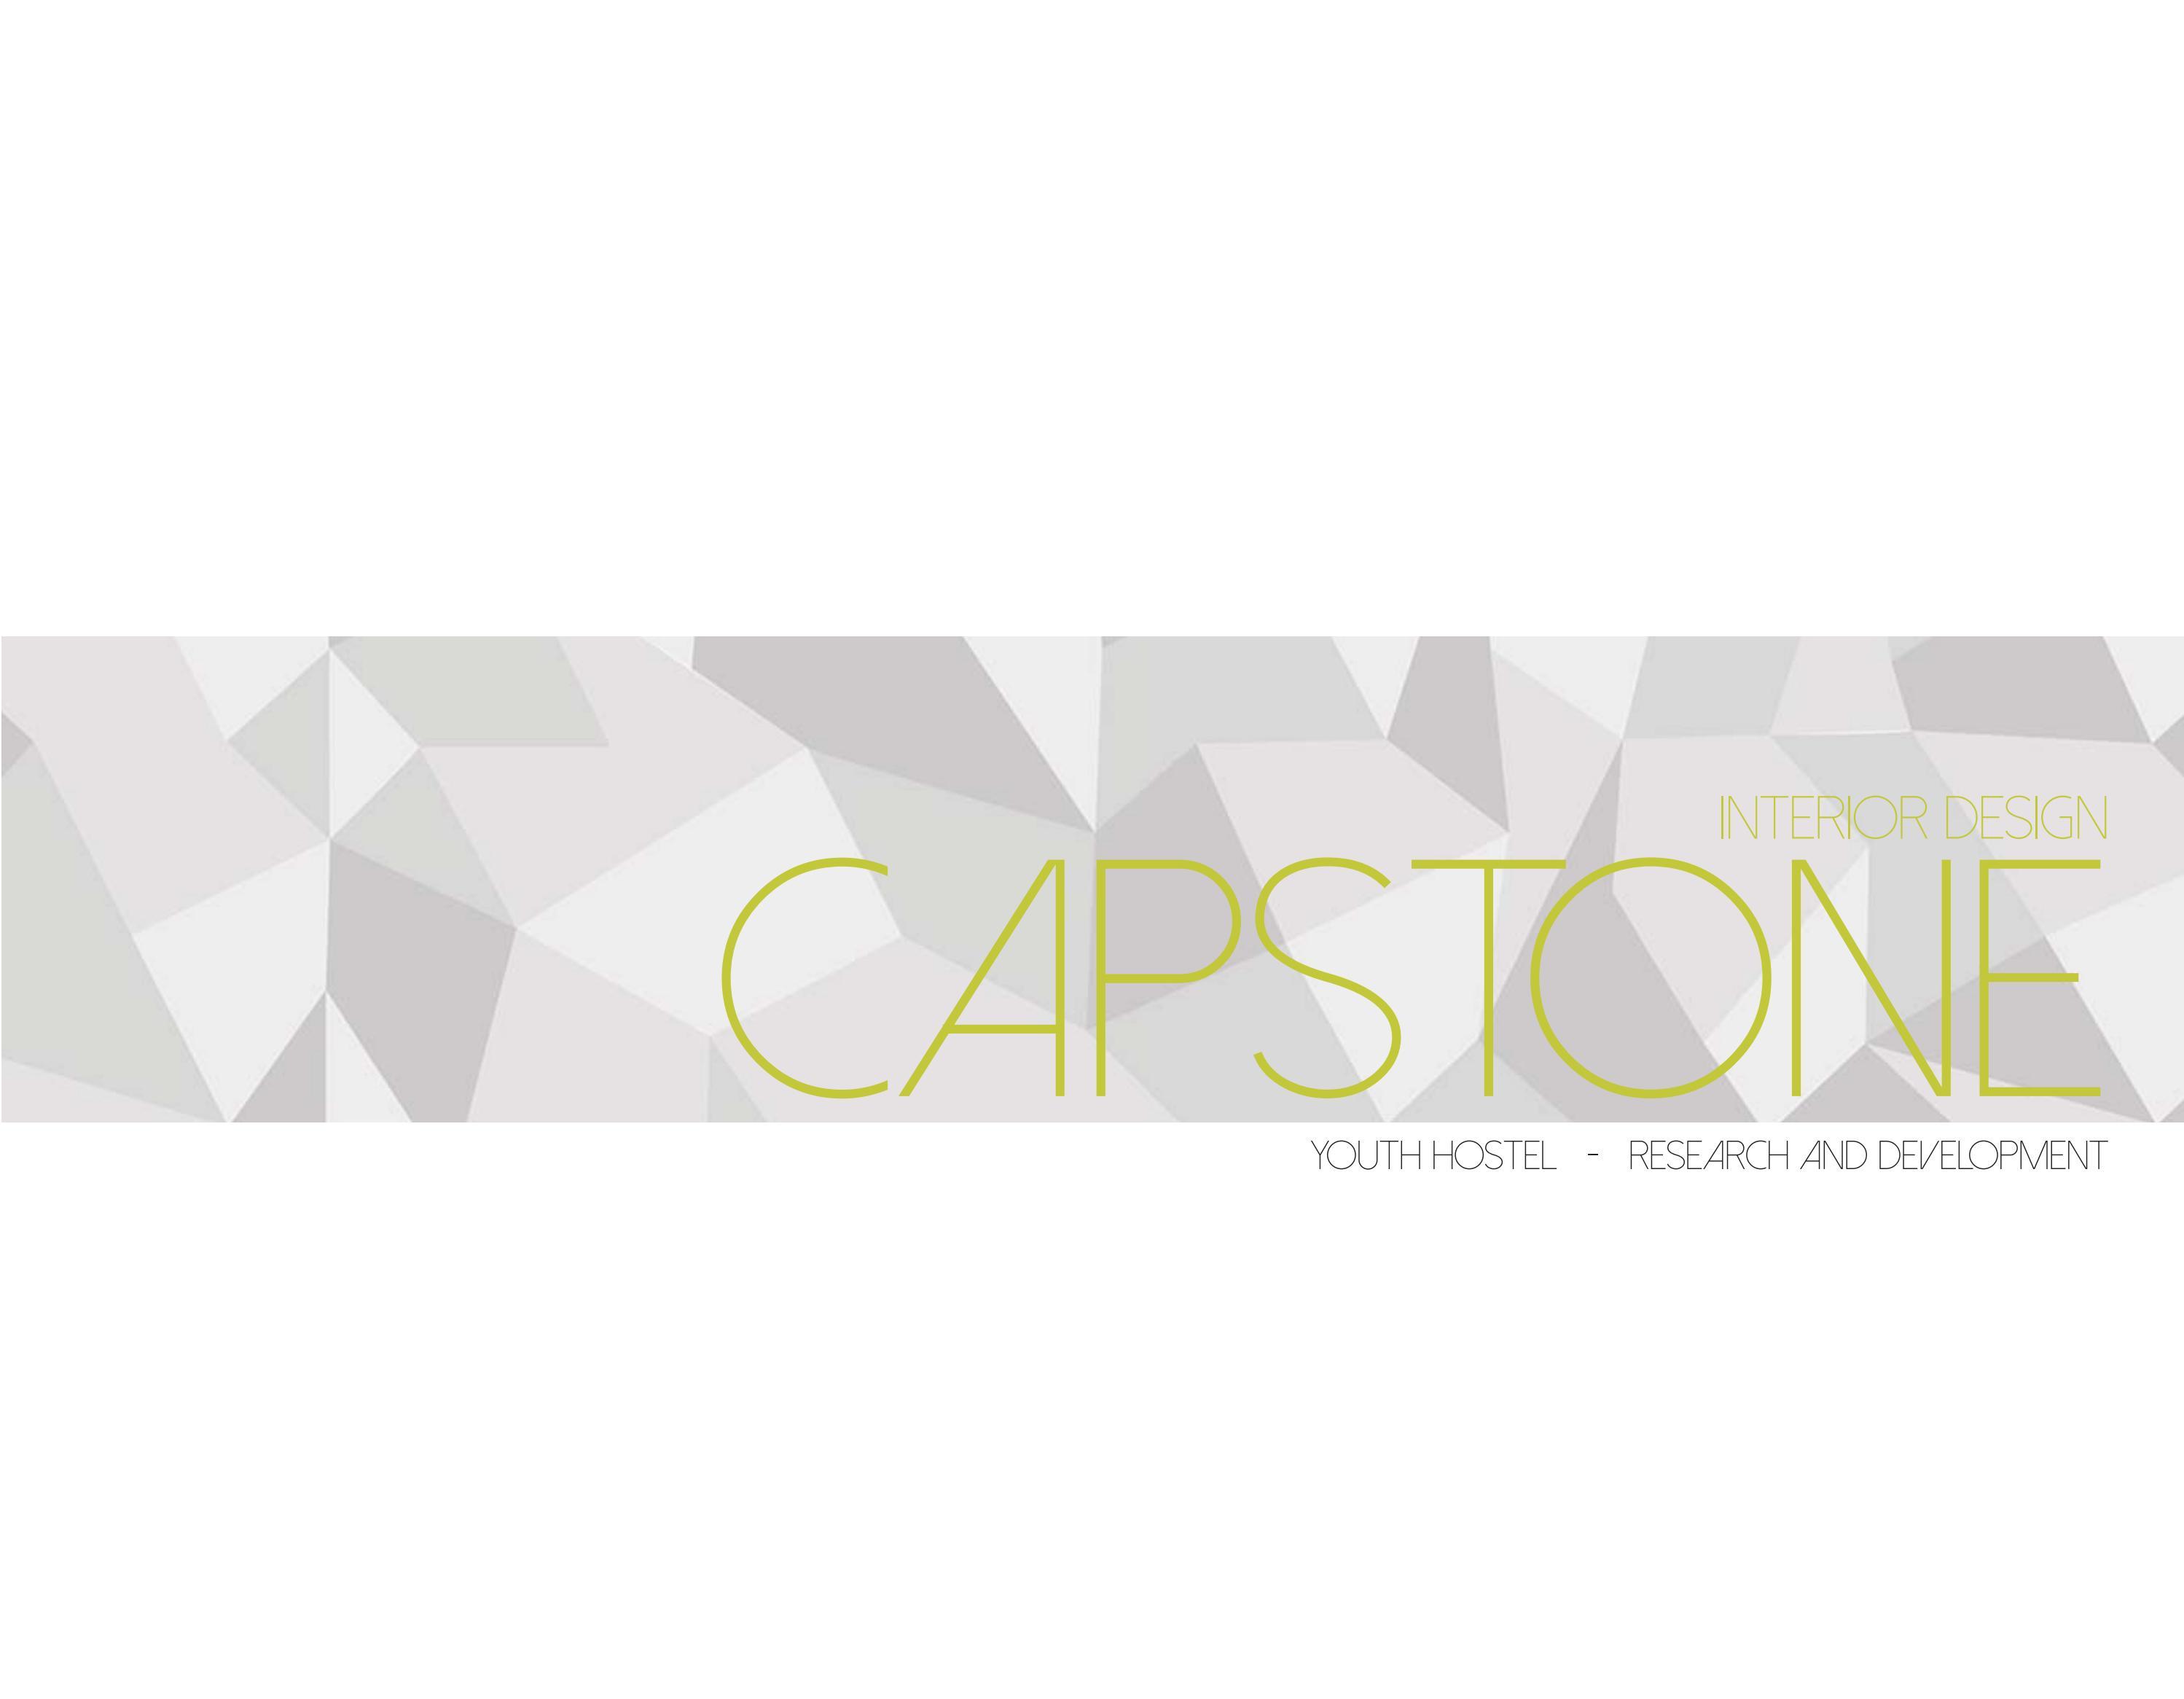 hostel design research  interior design capstone by victoria . hostel design research  interior design capstone by victoria wetzelberger issuu